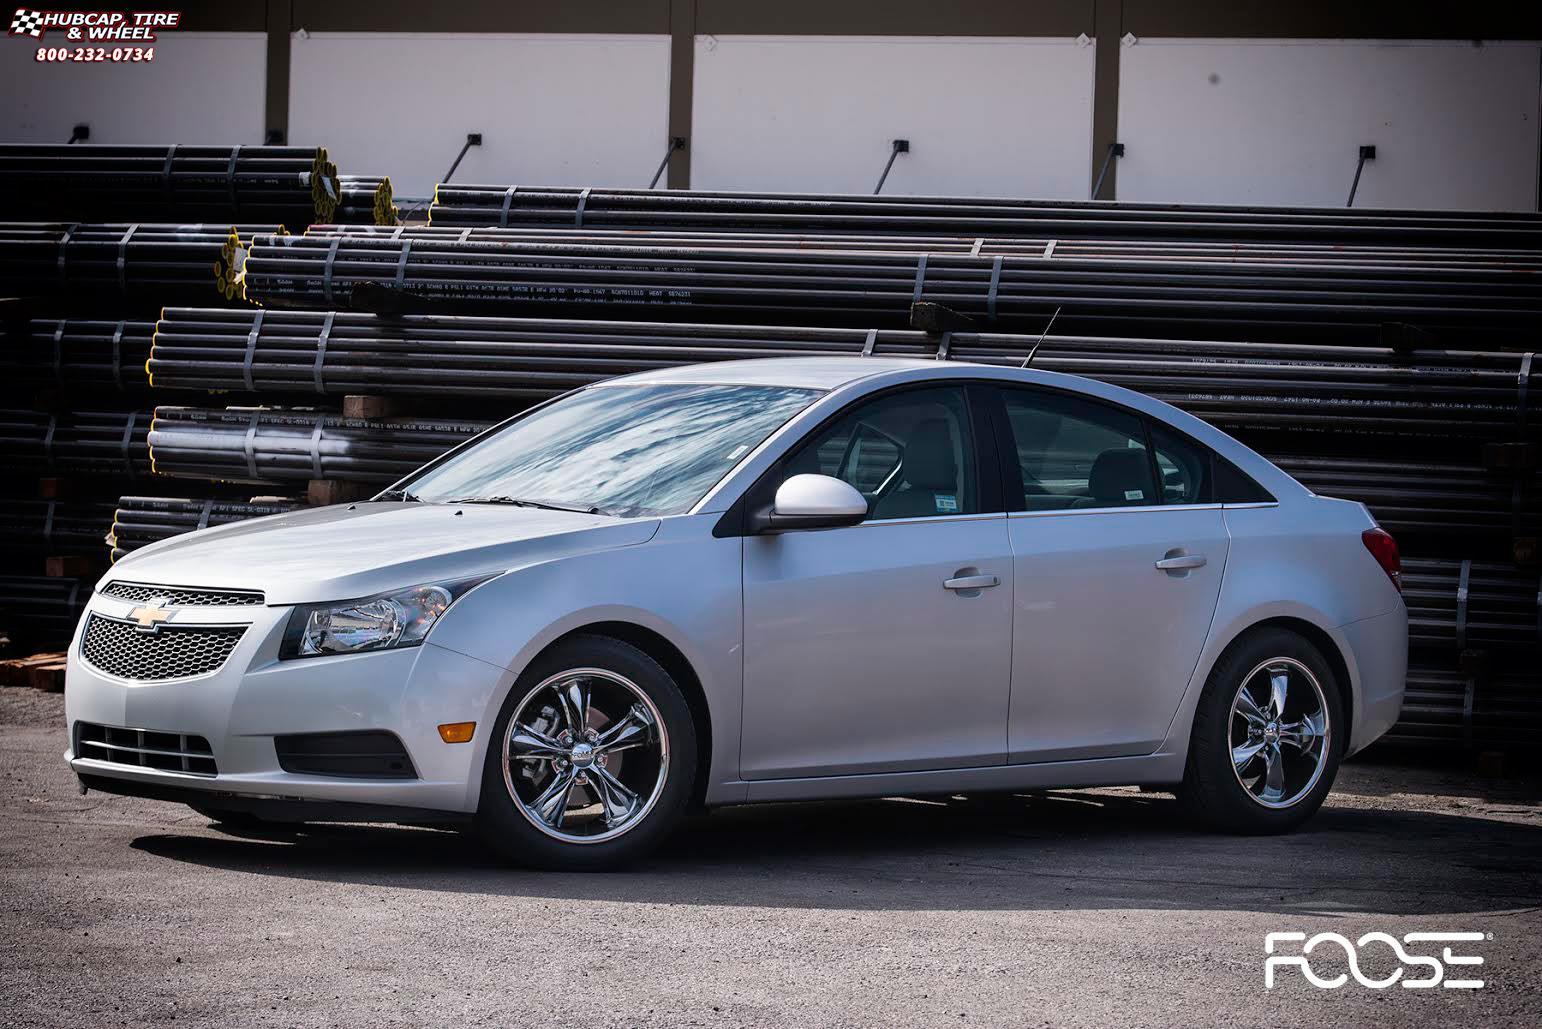 Cruze Tire Size New Car Models 2019 2020 5th Gen Navigation Wiring Info Toyota 4runner Forum Largest 2014 Chevrolet Foose Legend F103 Wheels Pvd